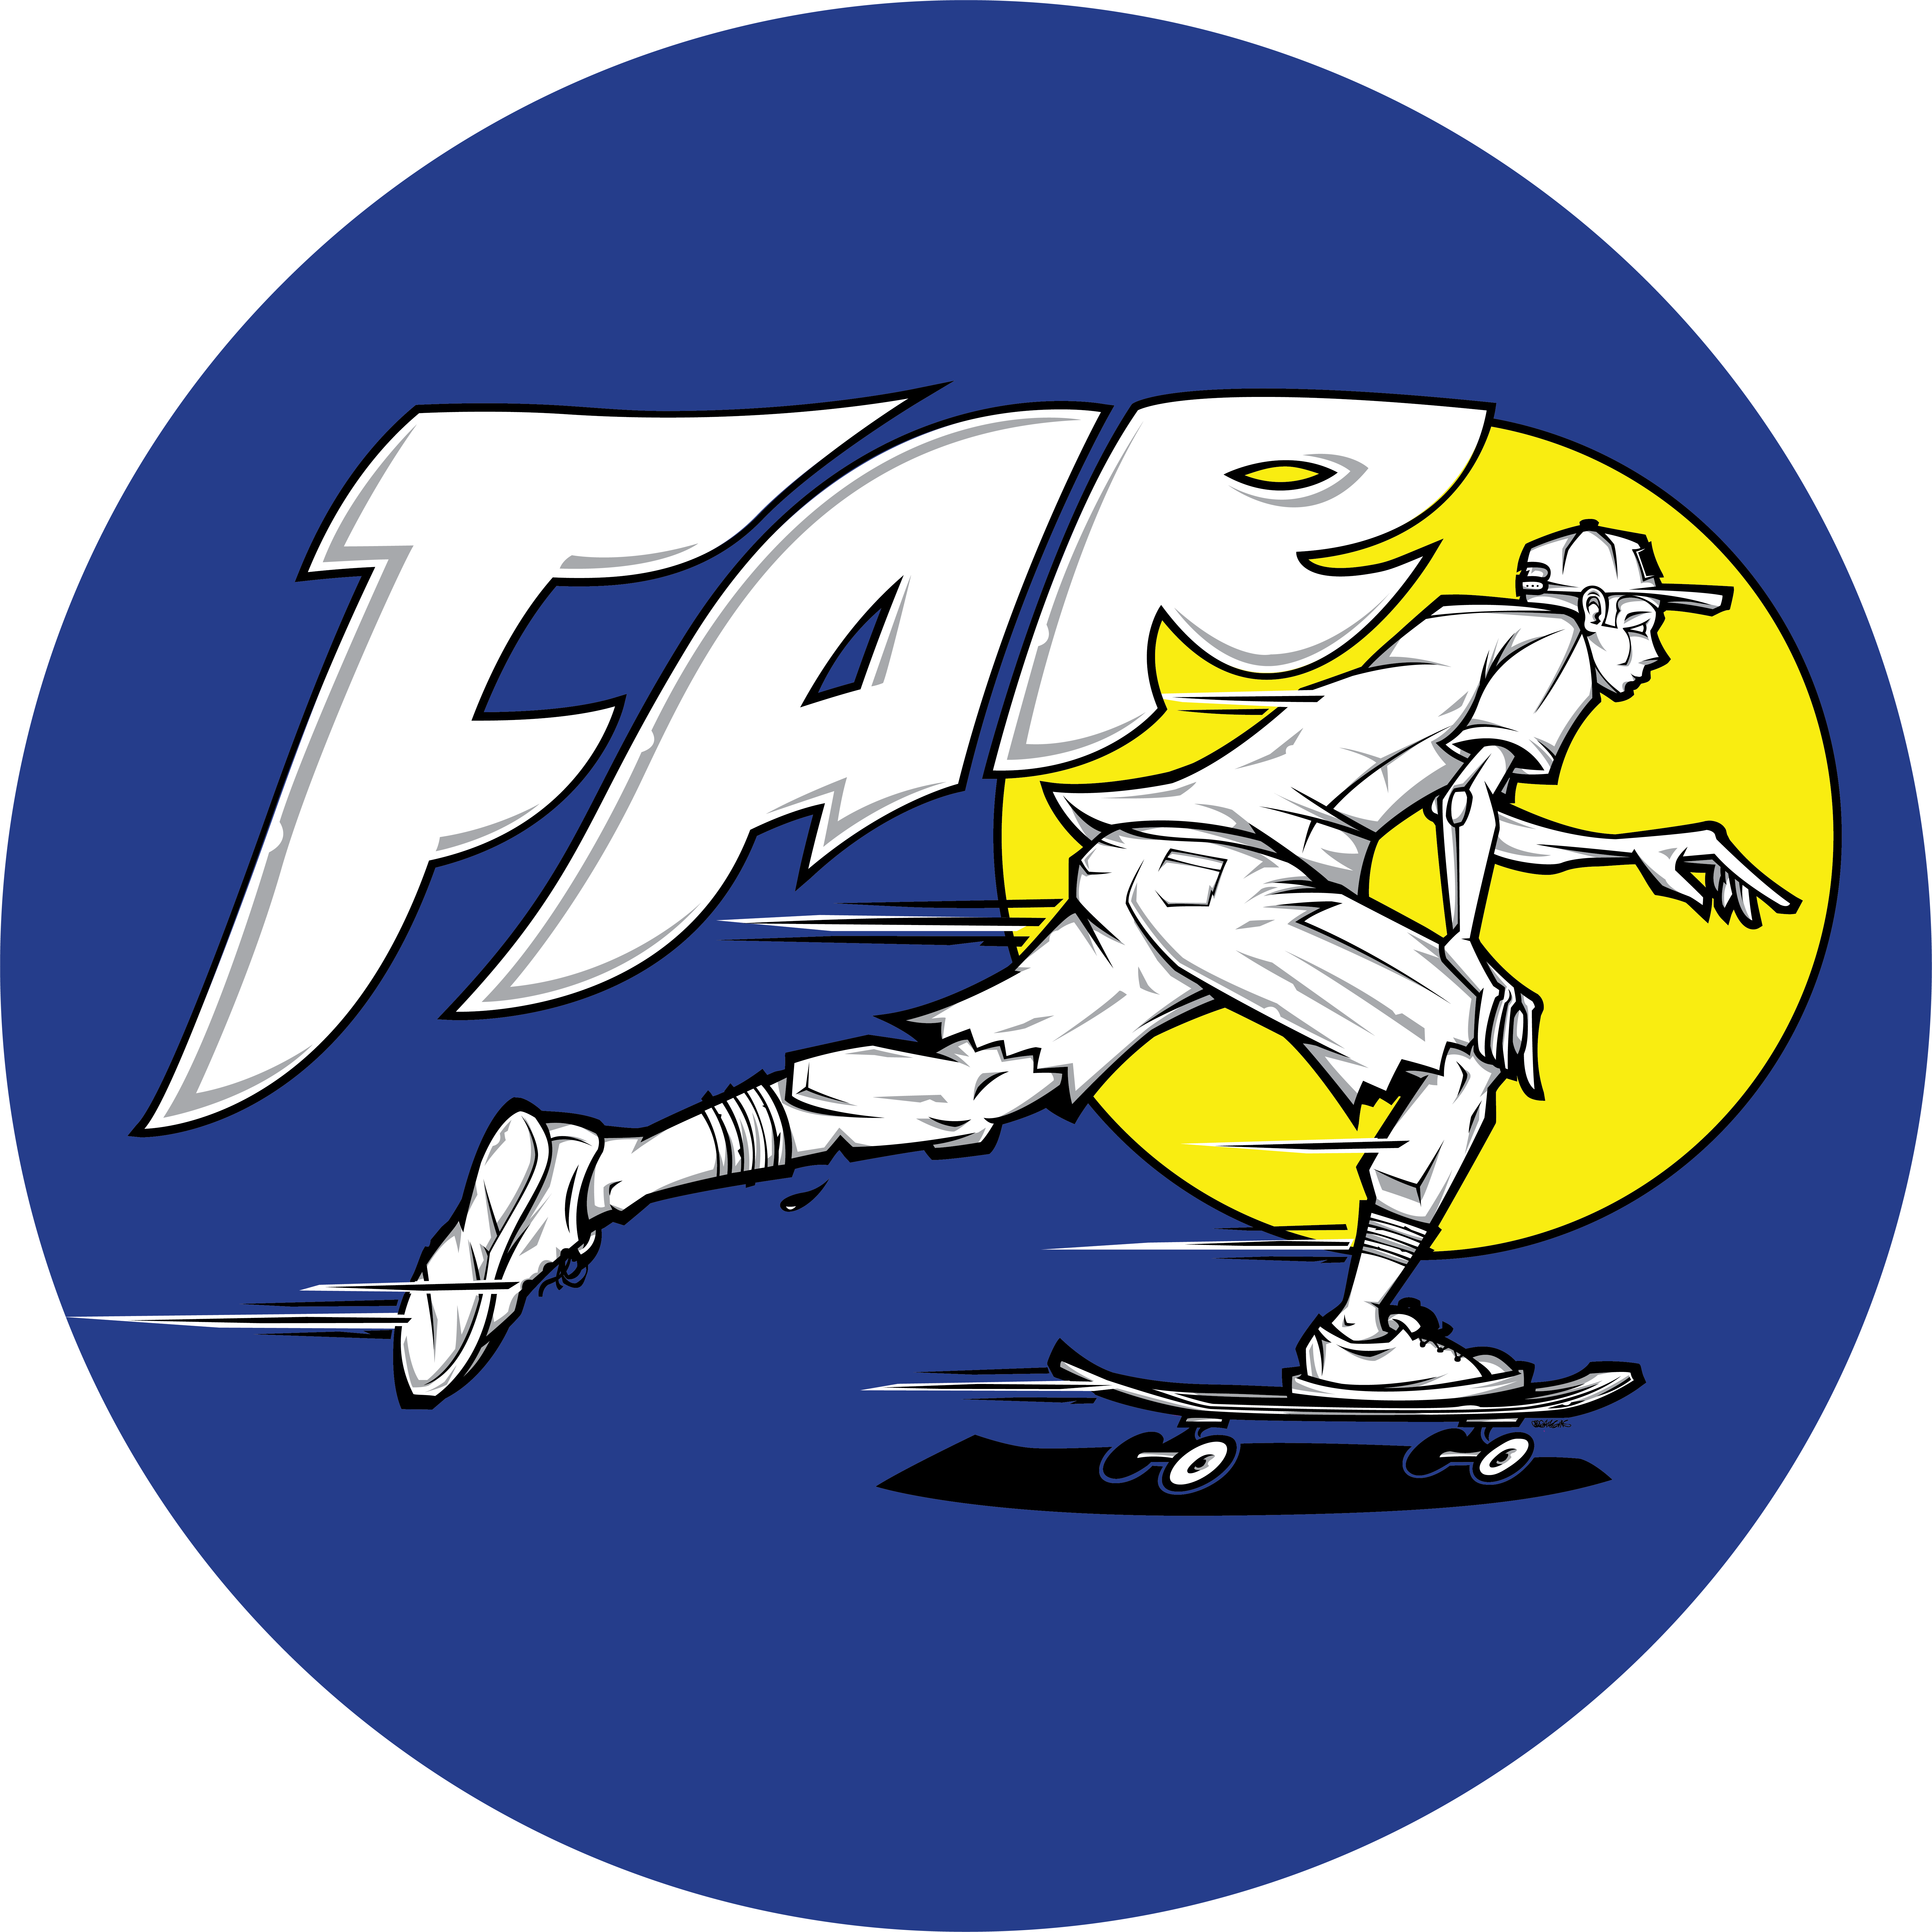 FAR Skate Foundation